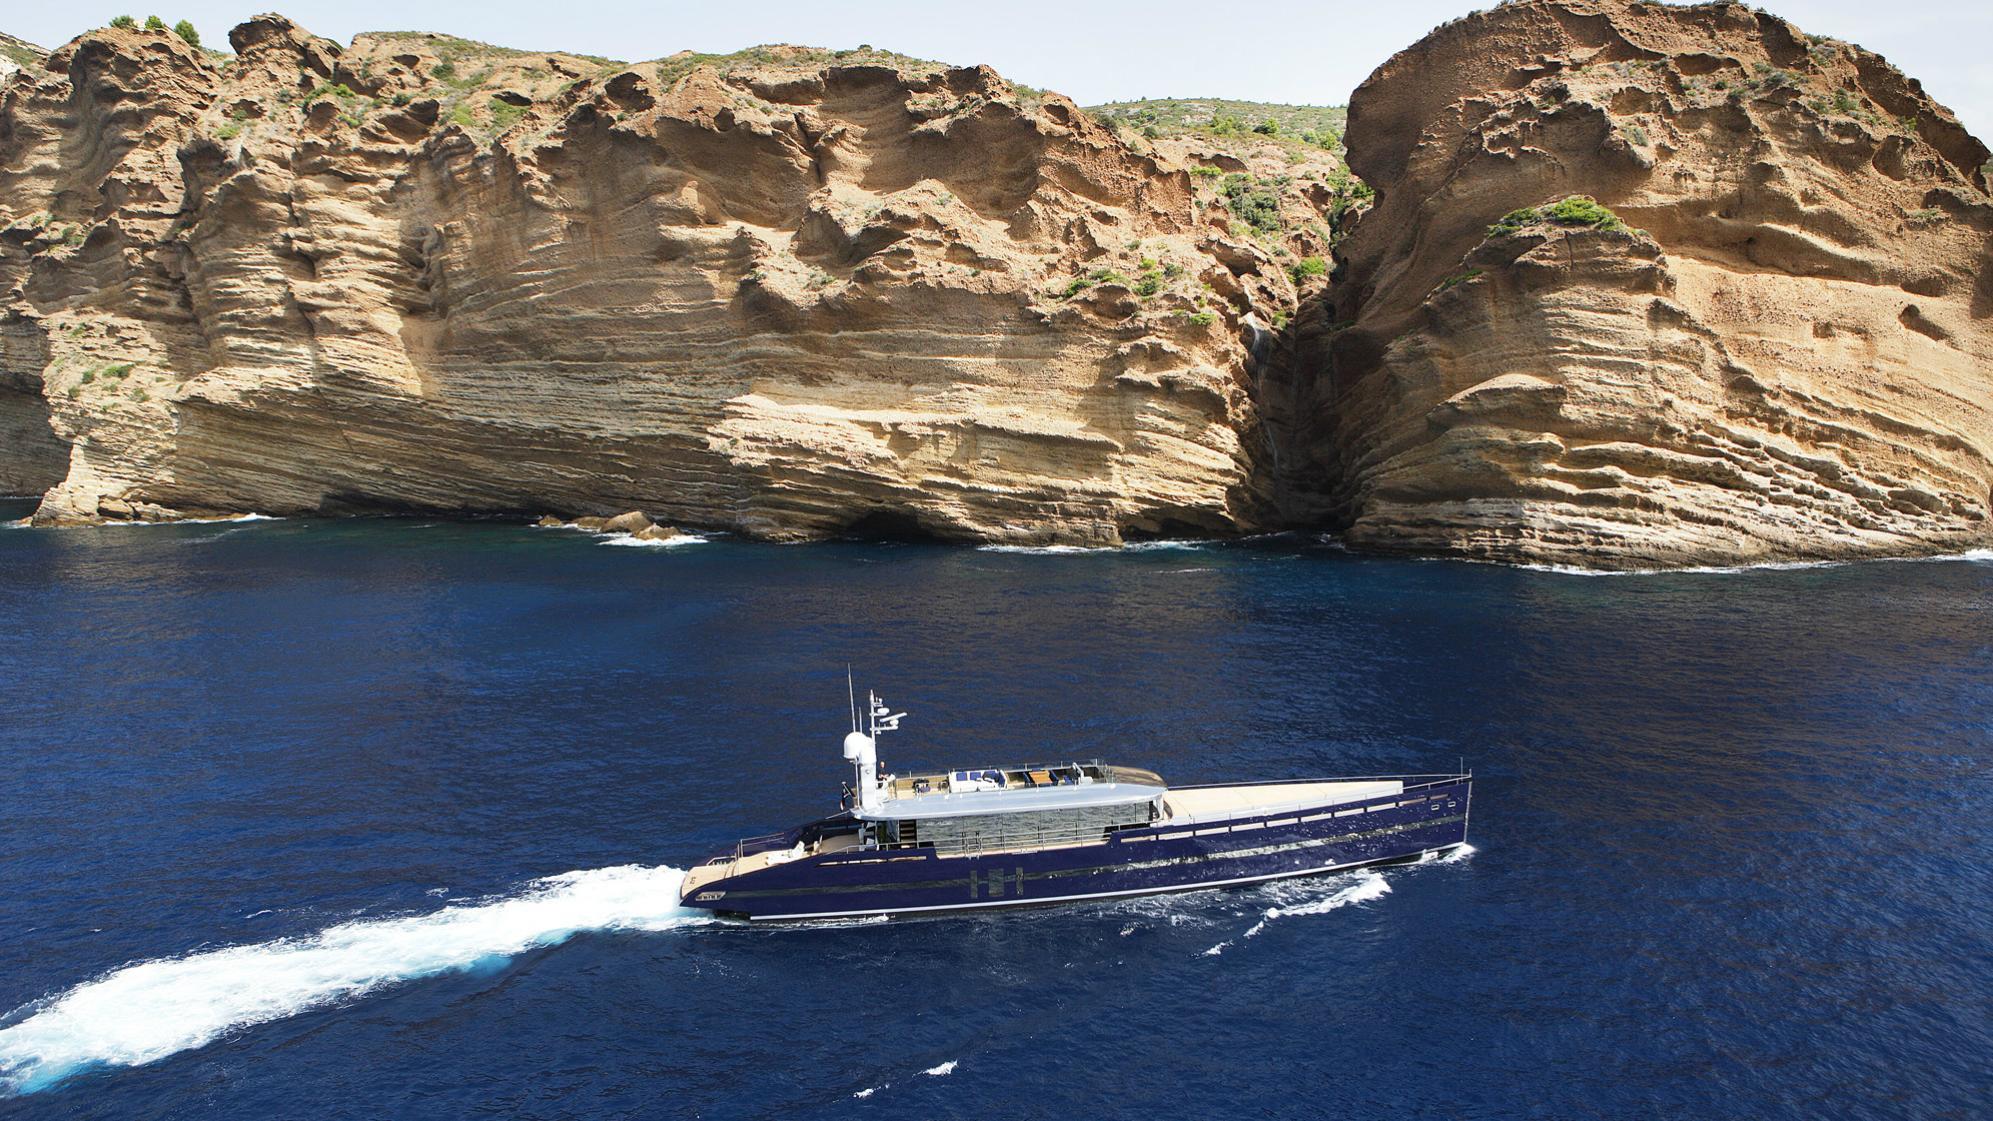 blade-motor-yacht-mmgi-2010-44m-profile-cruising